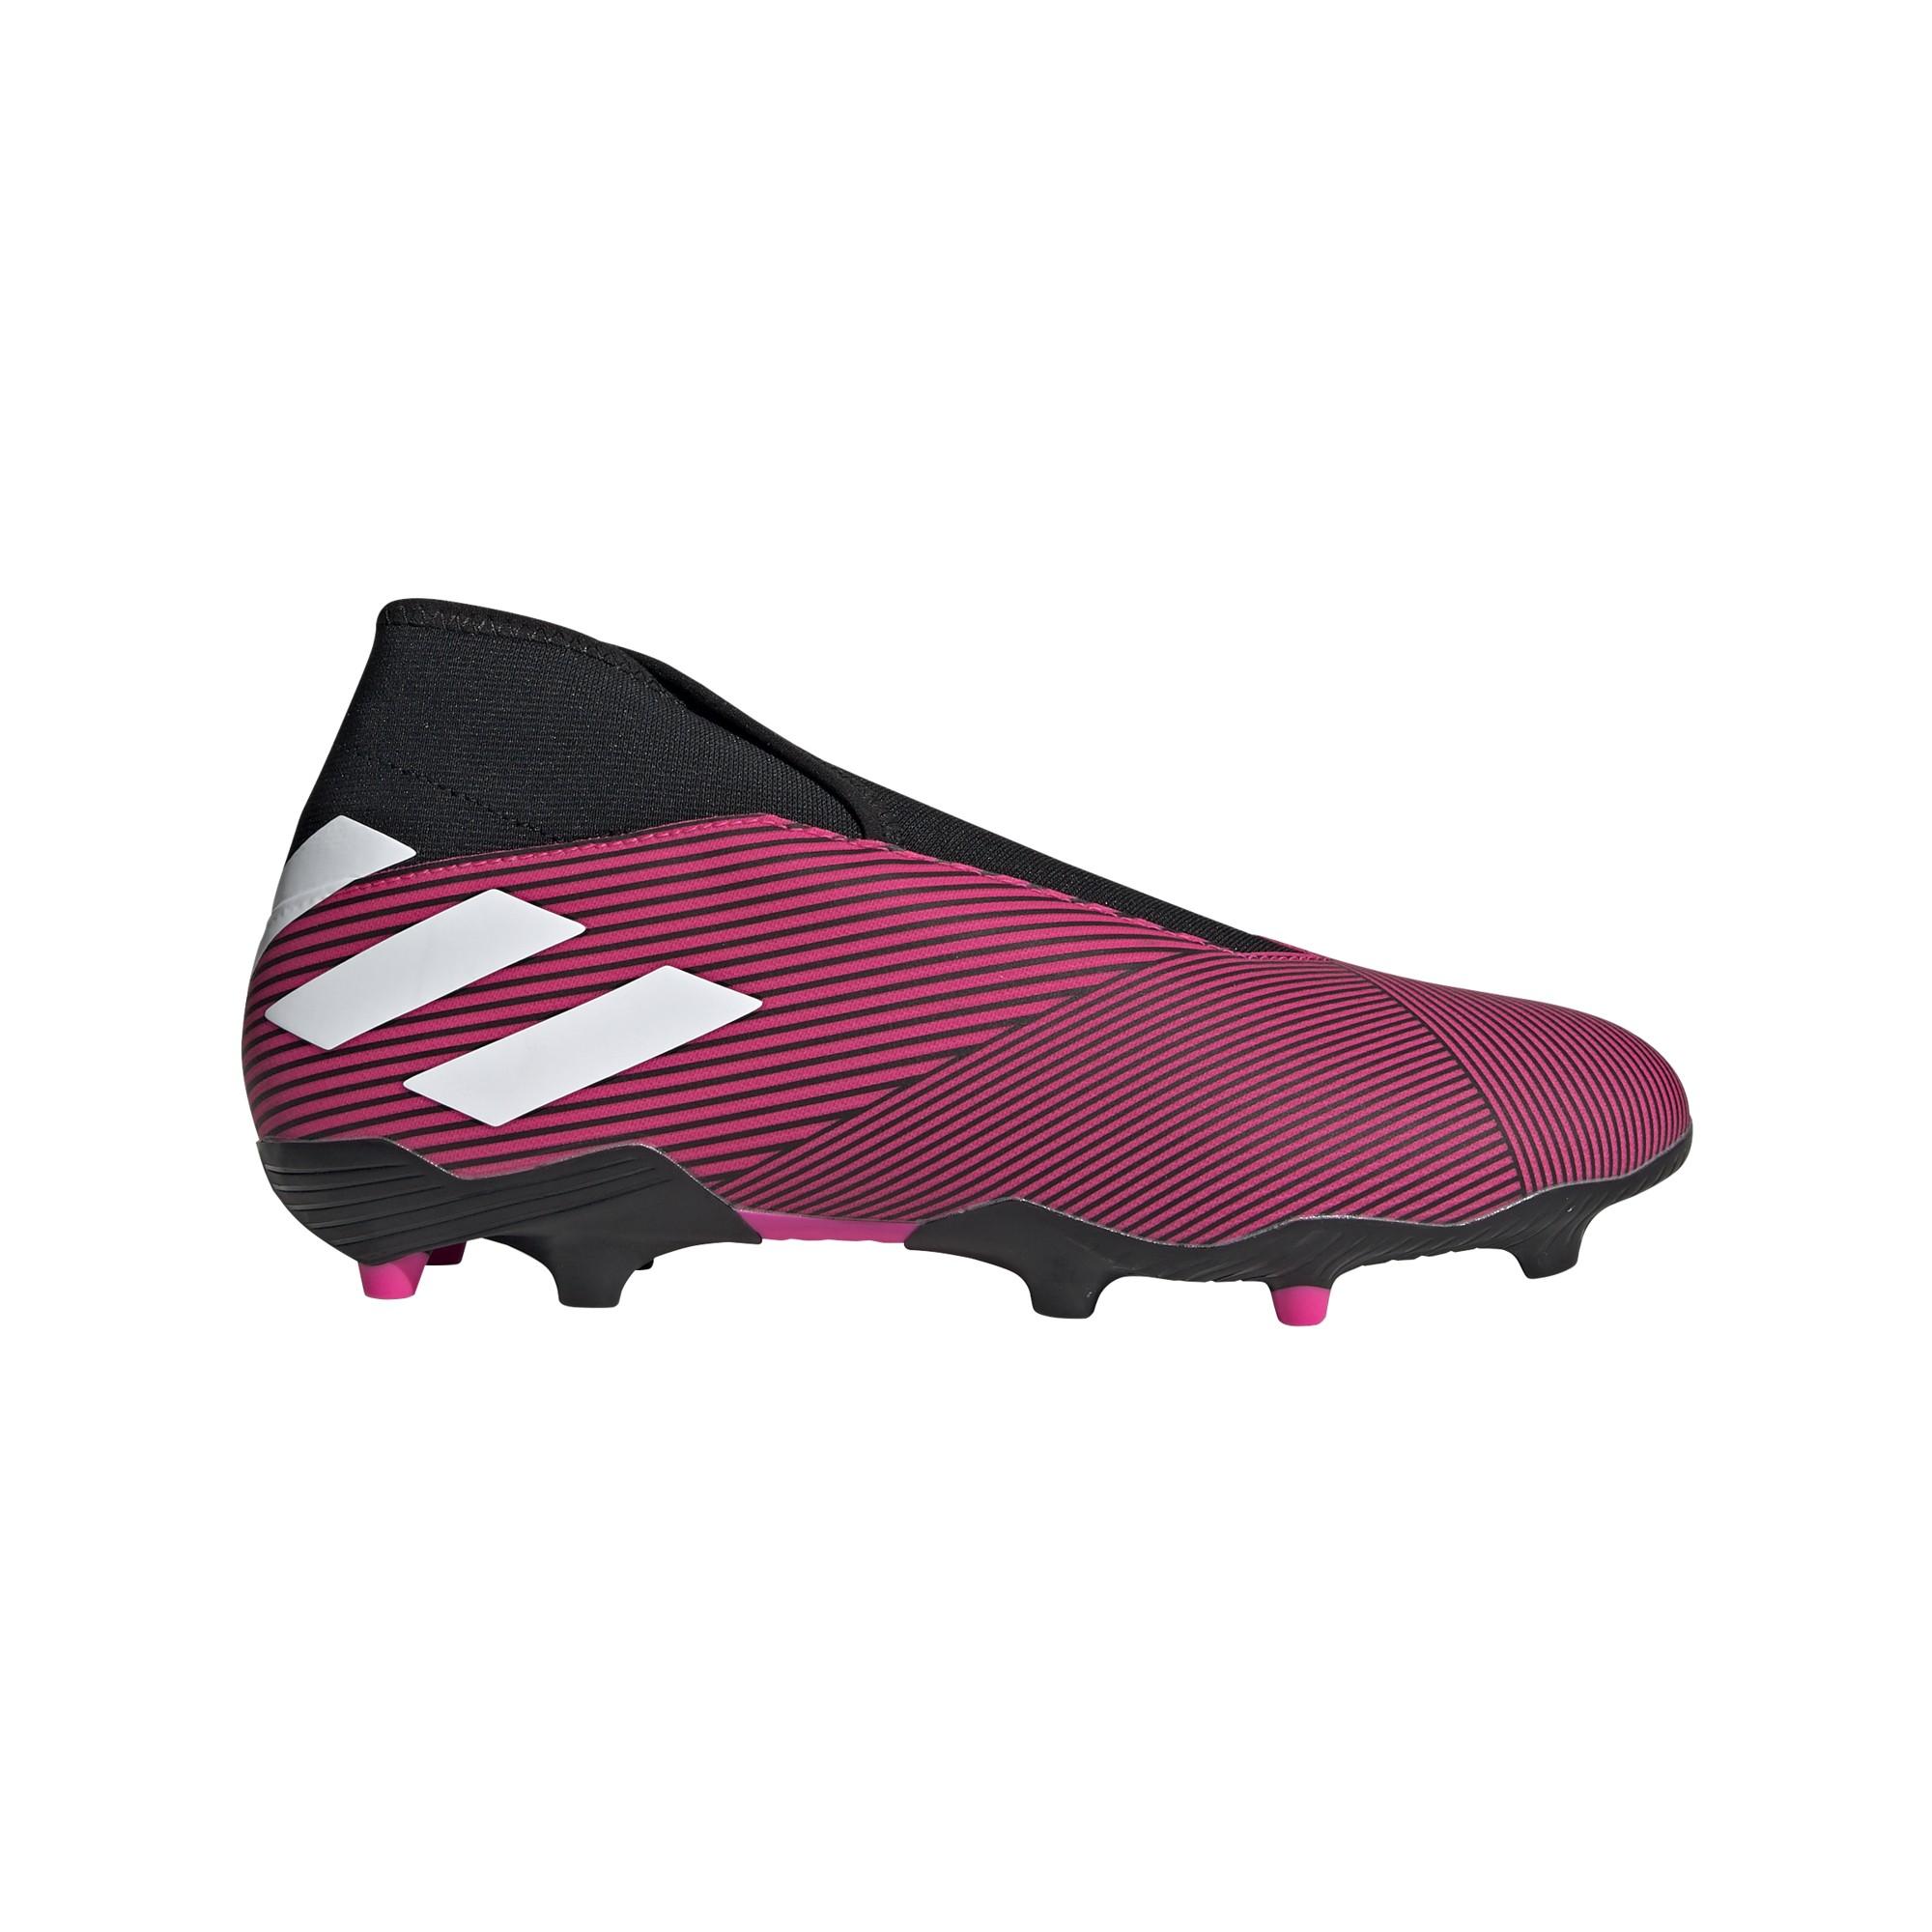 ADIDAS scarpe da calcio nemeziz 19.3 ll fg rosa bianco nero